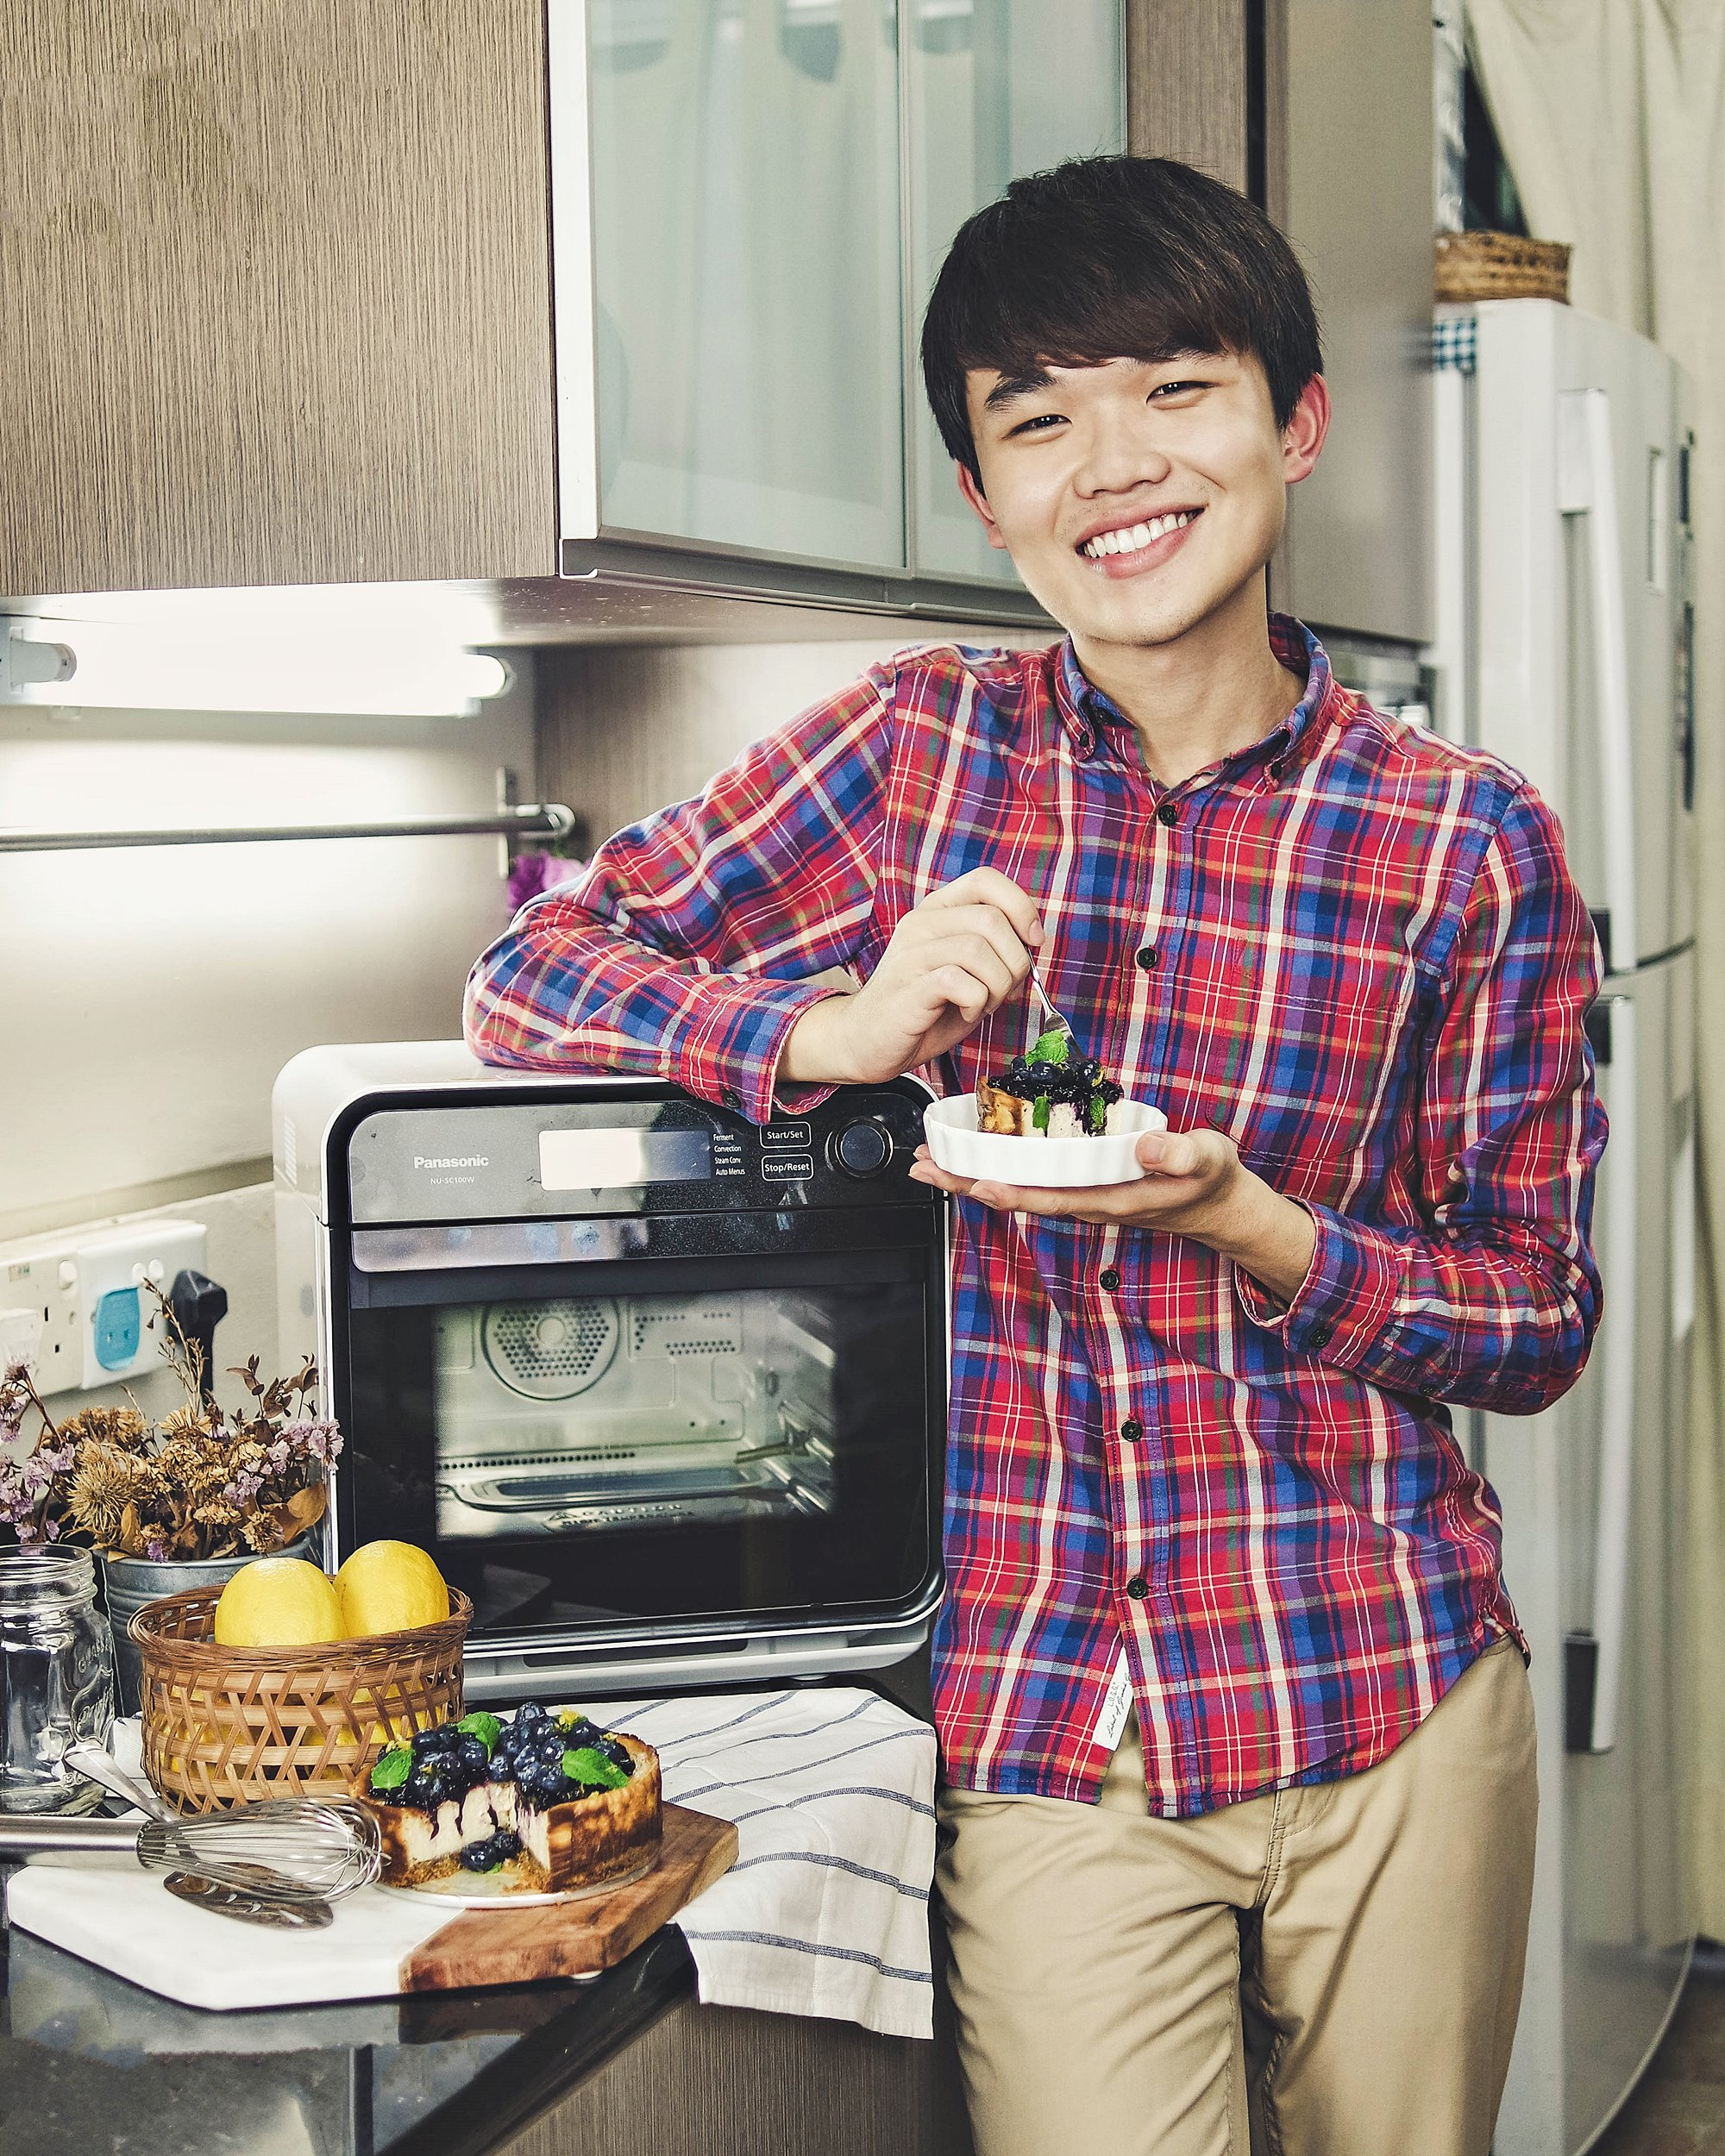 Honey Blueberry Cheesecake - Panasonic Cubie Oven